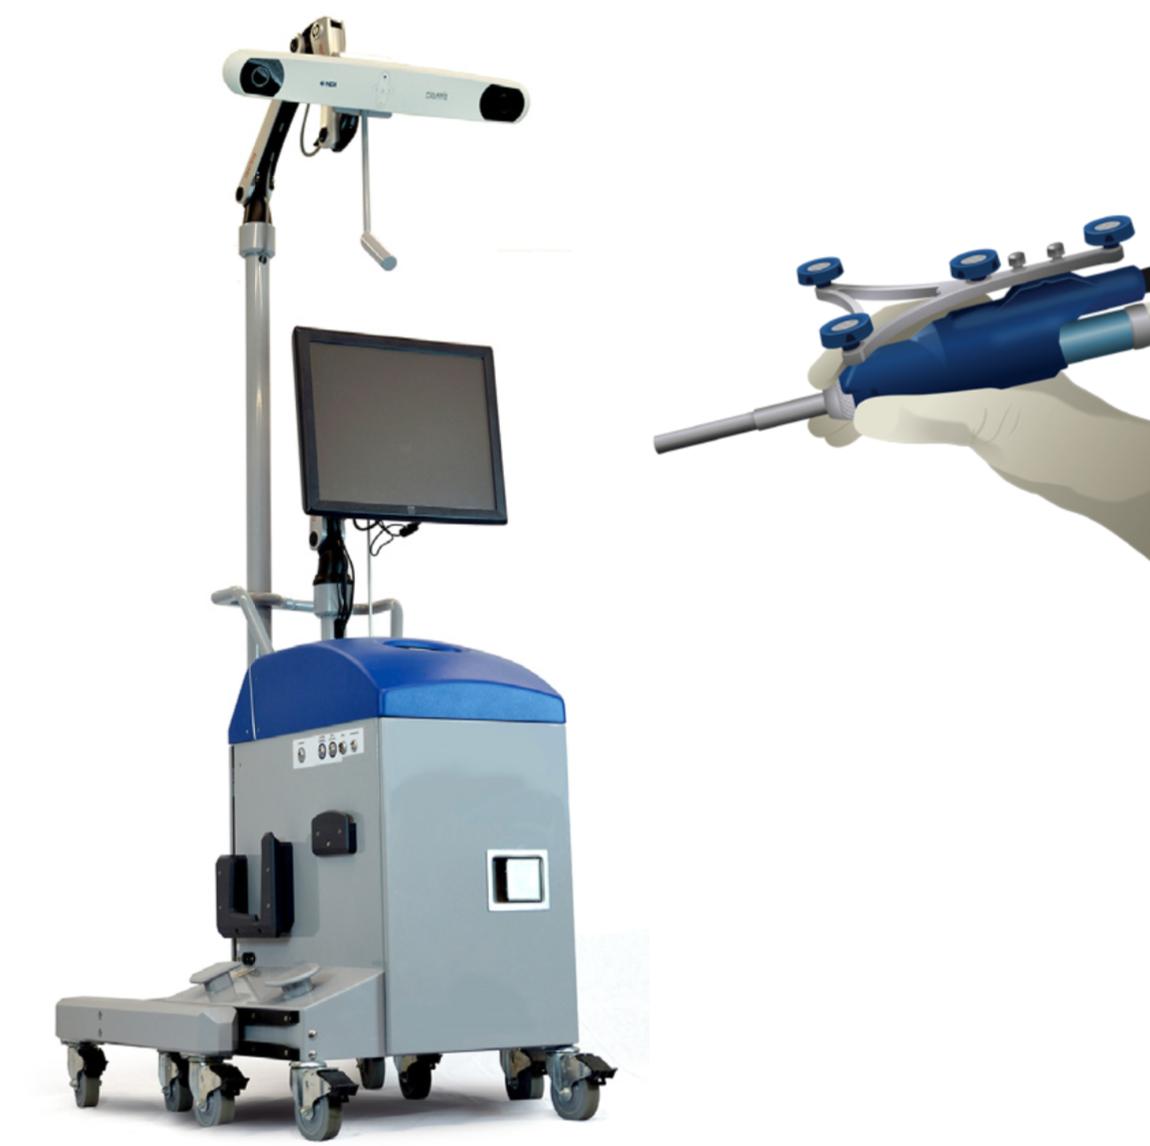 Navio Robotic System